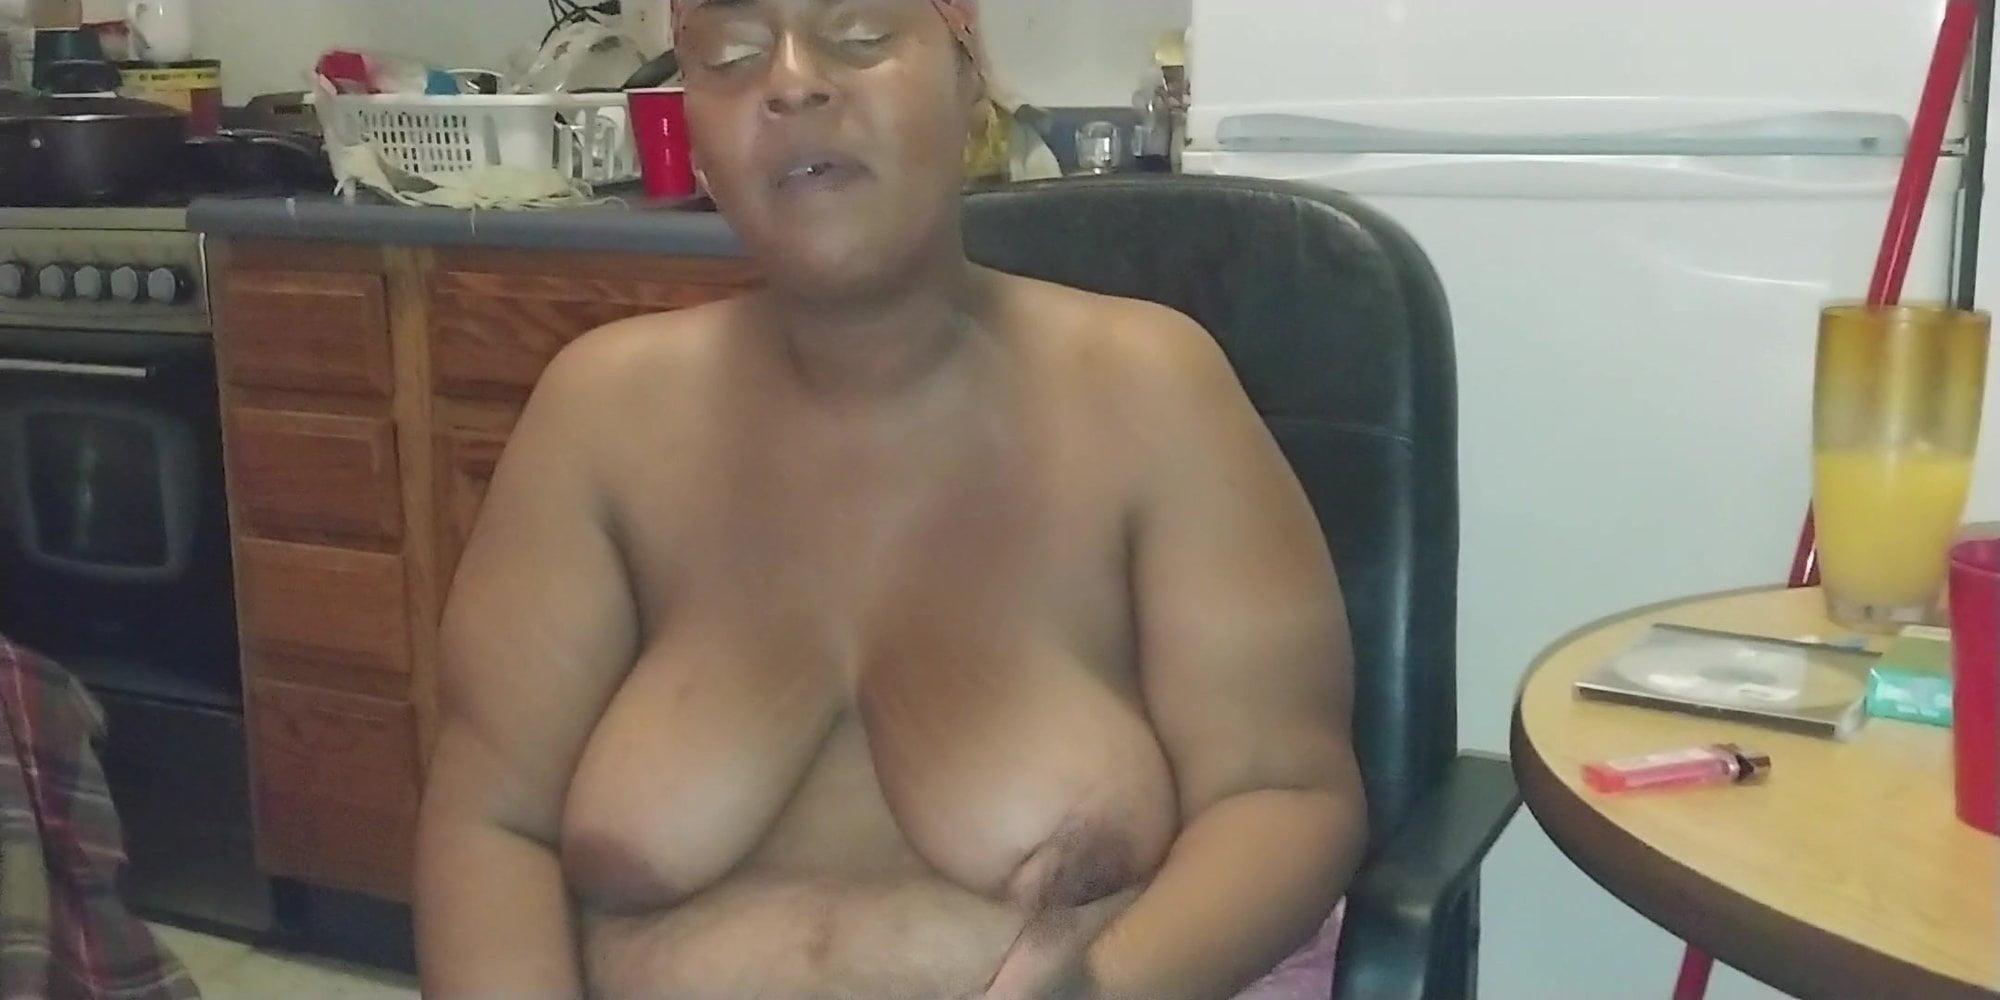 Free streaming midget porn